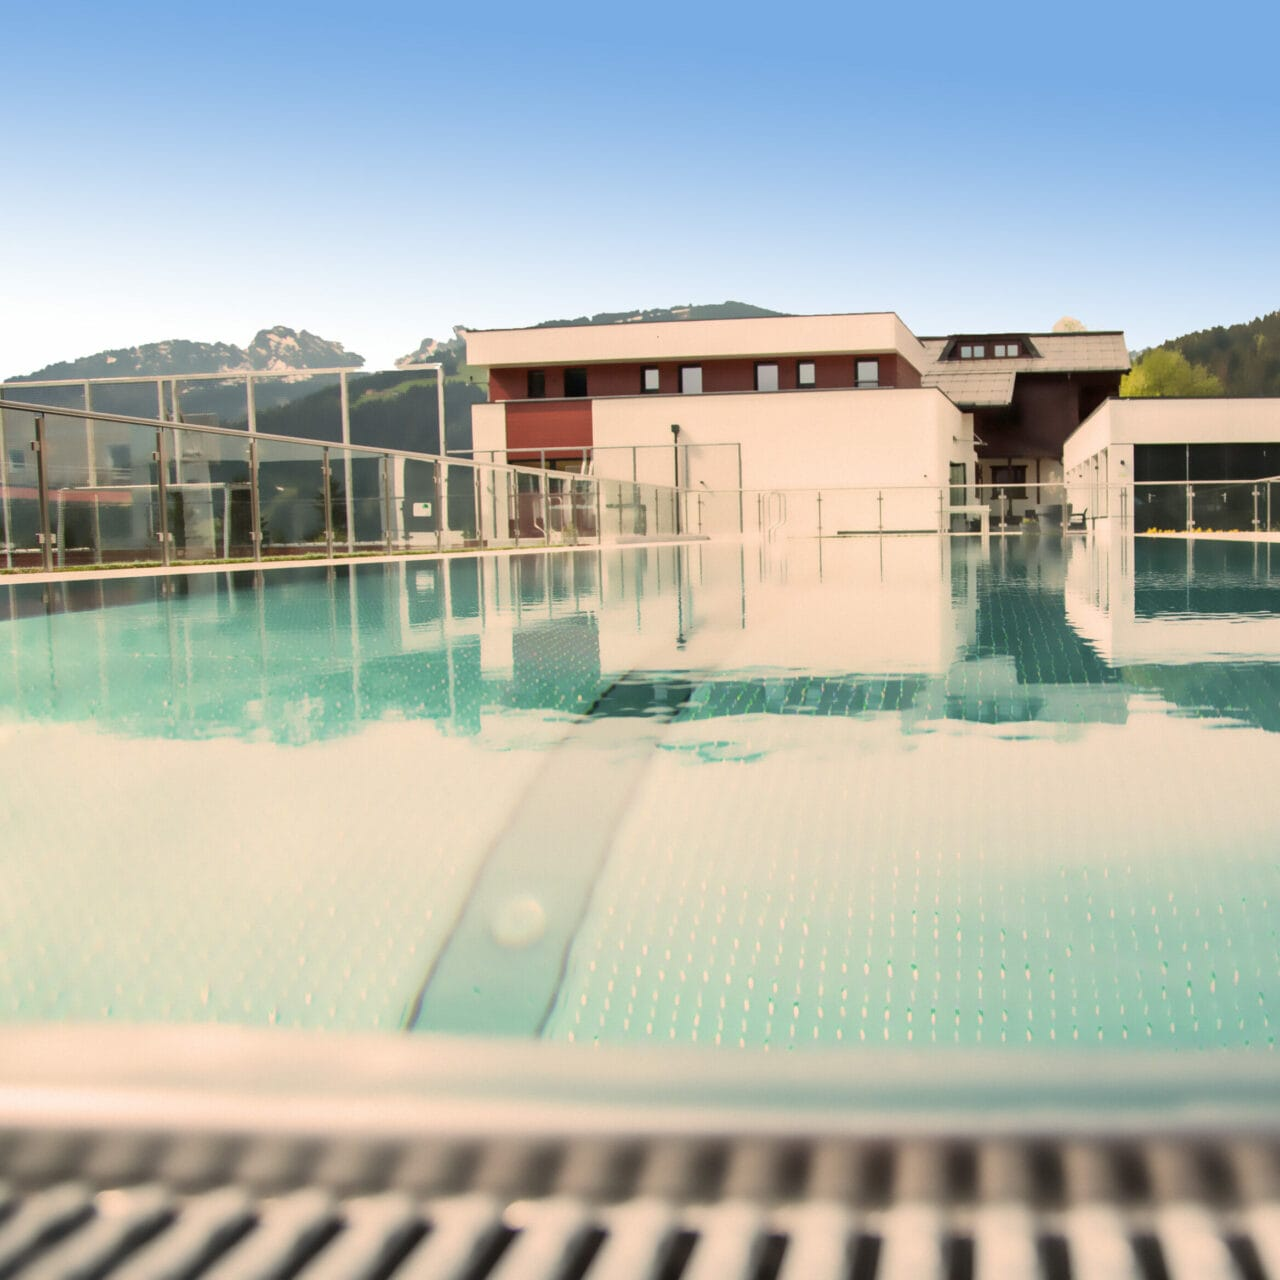 Hofgut-Apartment-lifestyle-resort-in-und-outdoorpools-sportbecken-totale2